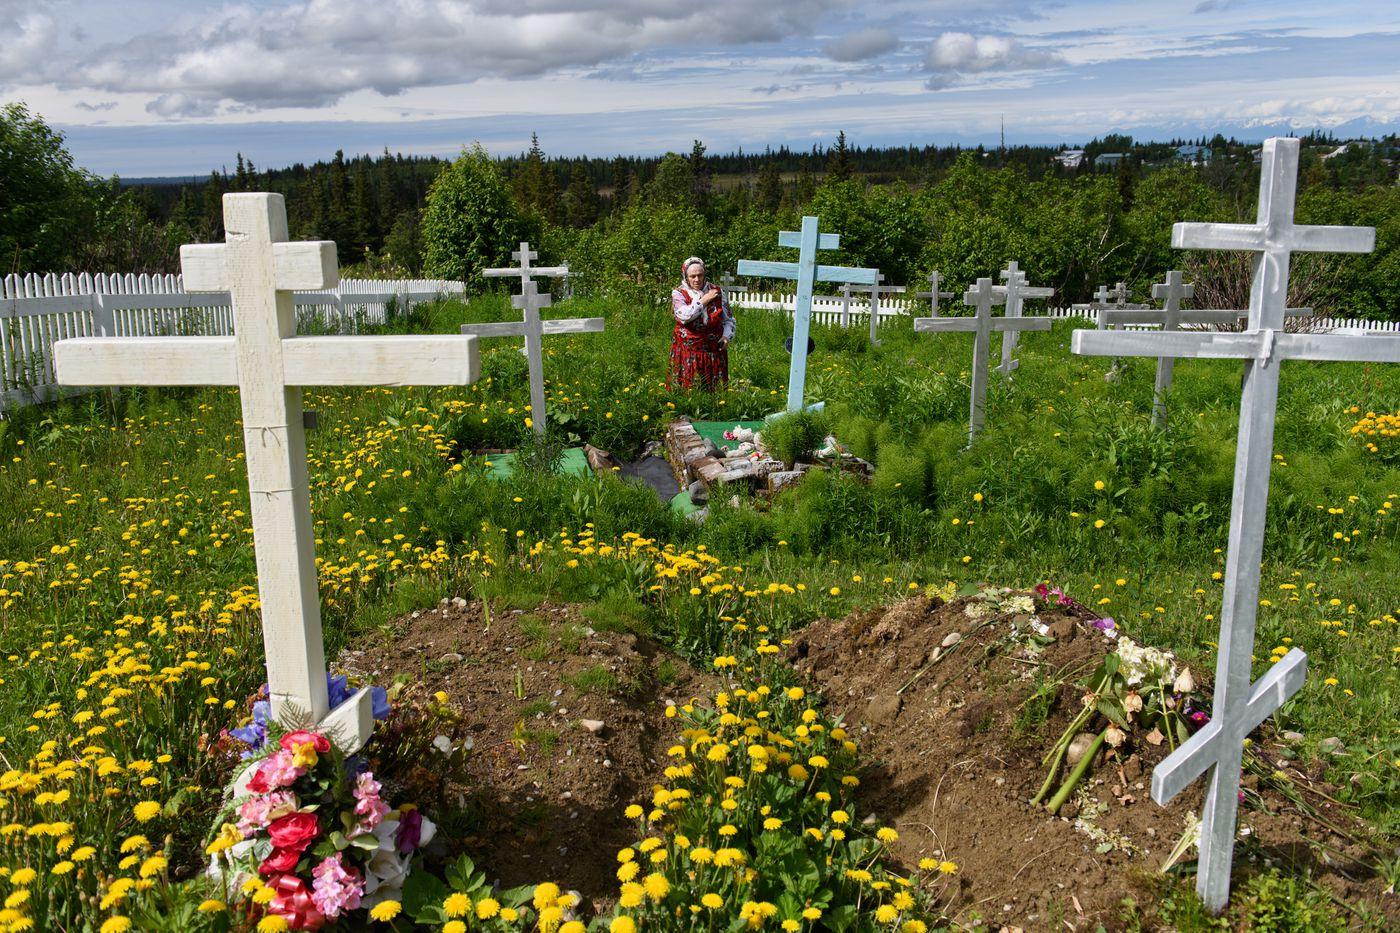 Nina Fefelov visits her mother Maria Kiselyova's grave at the Nikolaevsk cemetery. (Marc Lester / ADN)